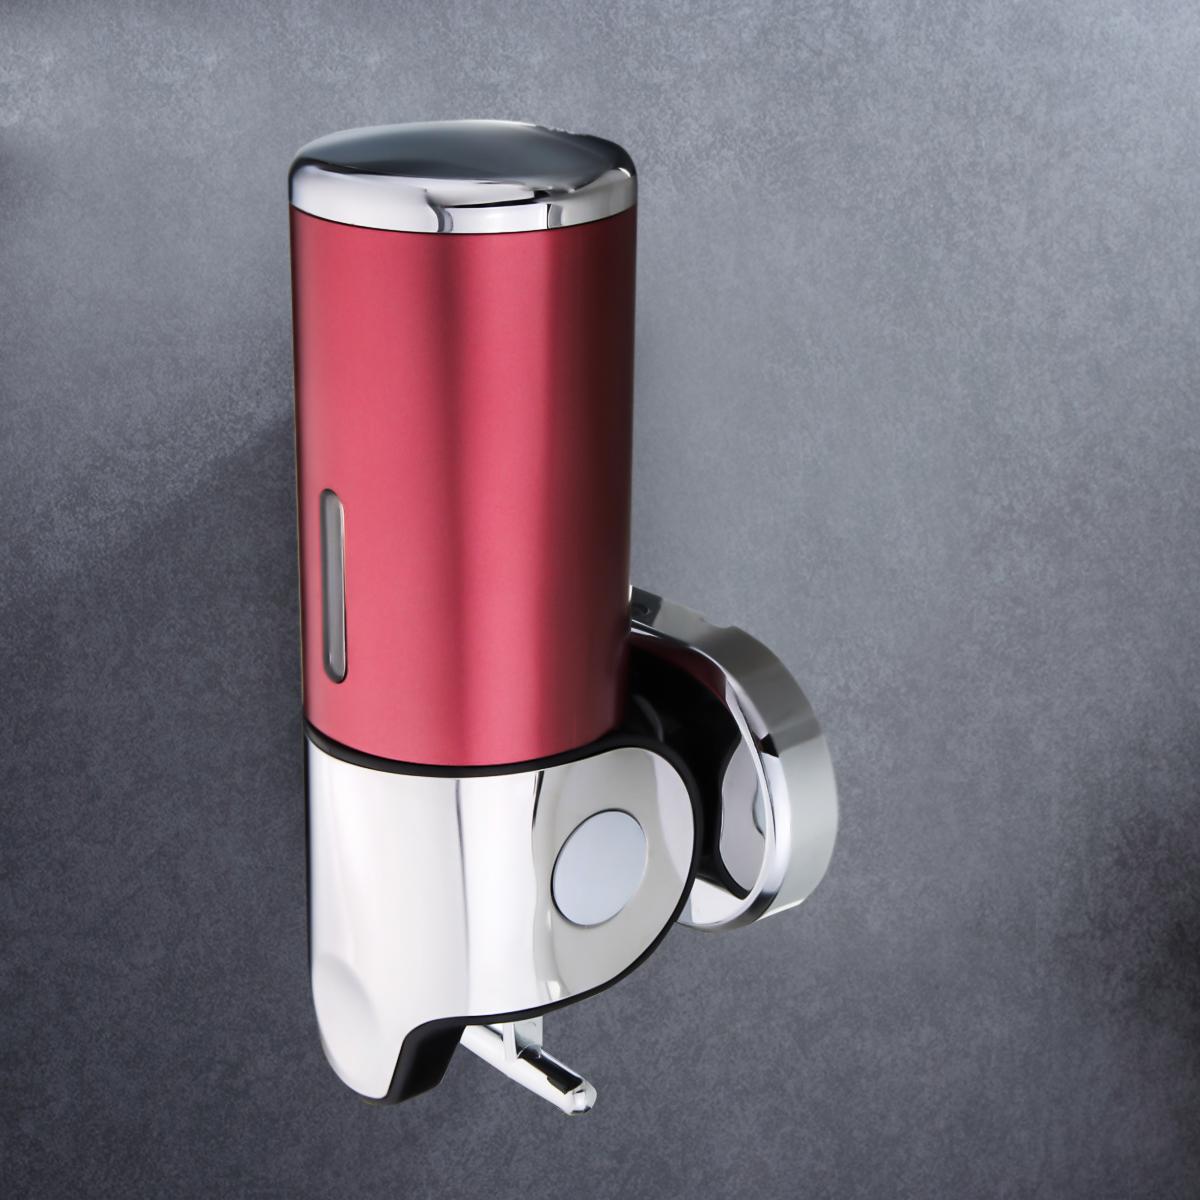 500ml Modern Wall Mount Stainless Steel Hand Soap & Lotion Dispenser Pump Foam Bottles Liquid Shampoo Container Sanitizer For Bathroom Kitchen Sink Countertops